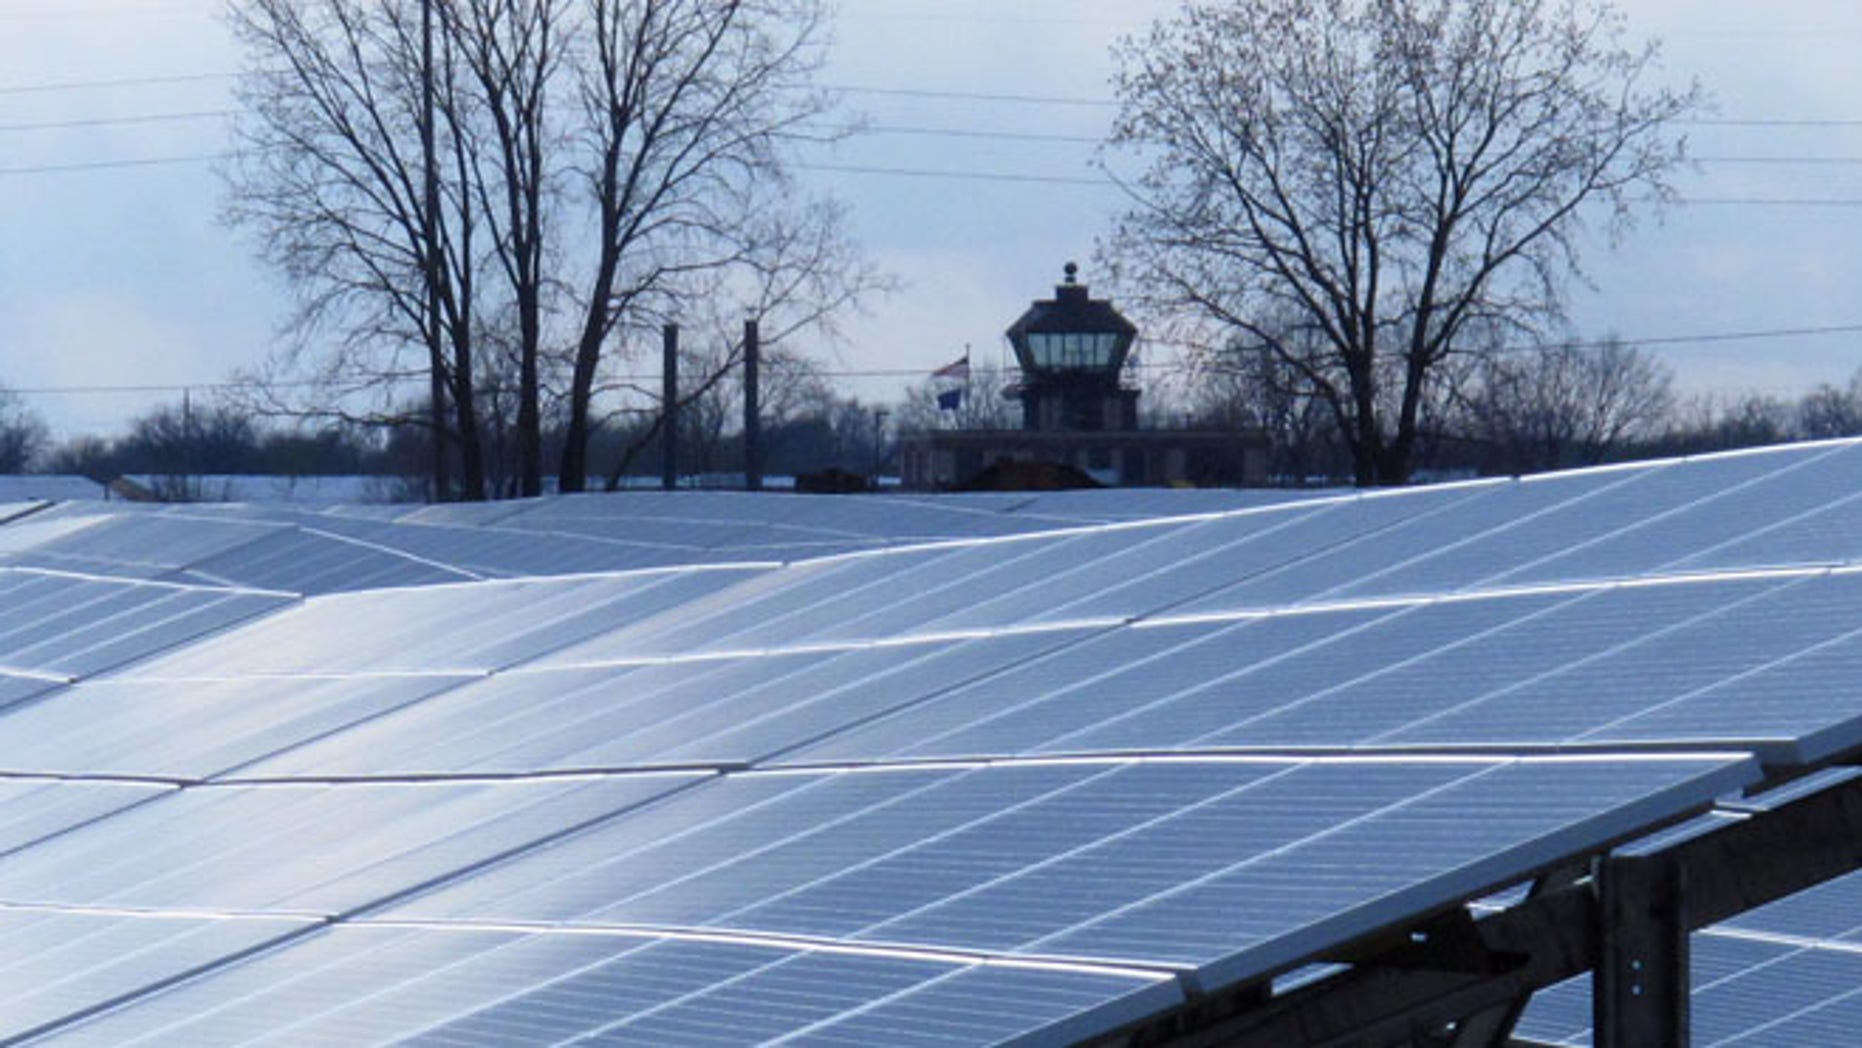 April 15, 2013: Sunlight streams onto the 43-acre Maywood Solar Farm.